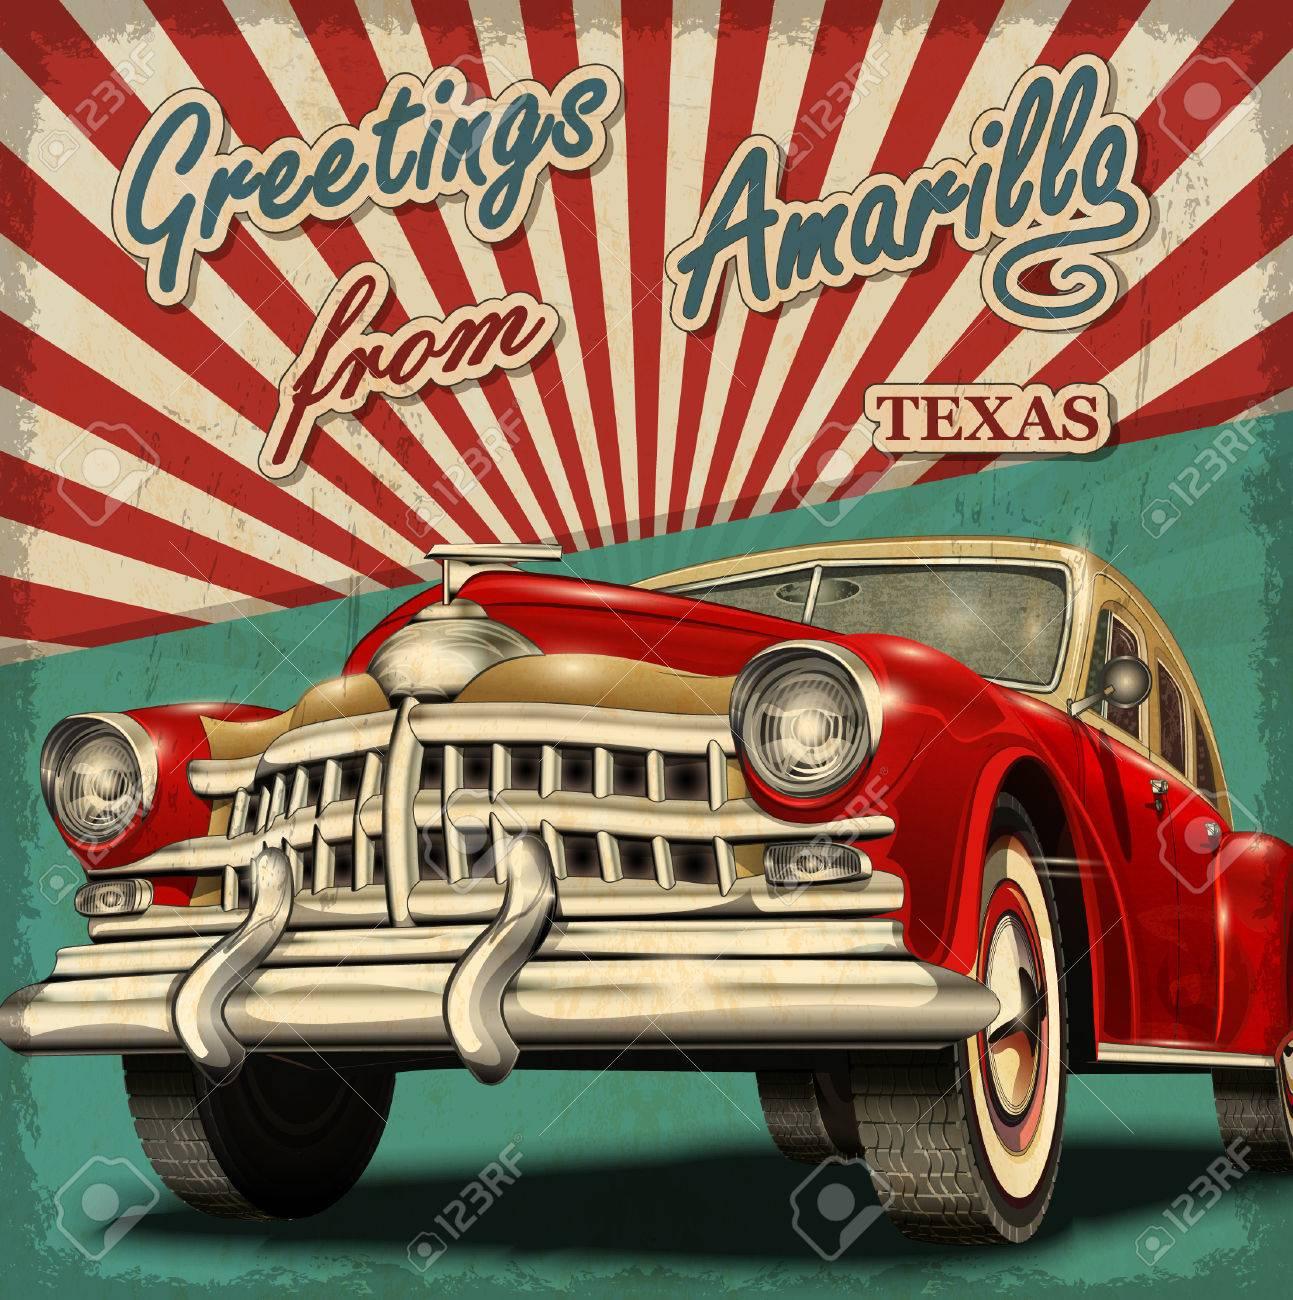 Vintage touristic greeting card with retro car.Amarillo.Texas. - 55953234